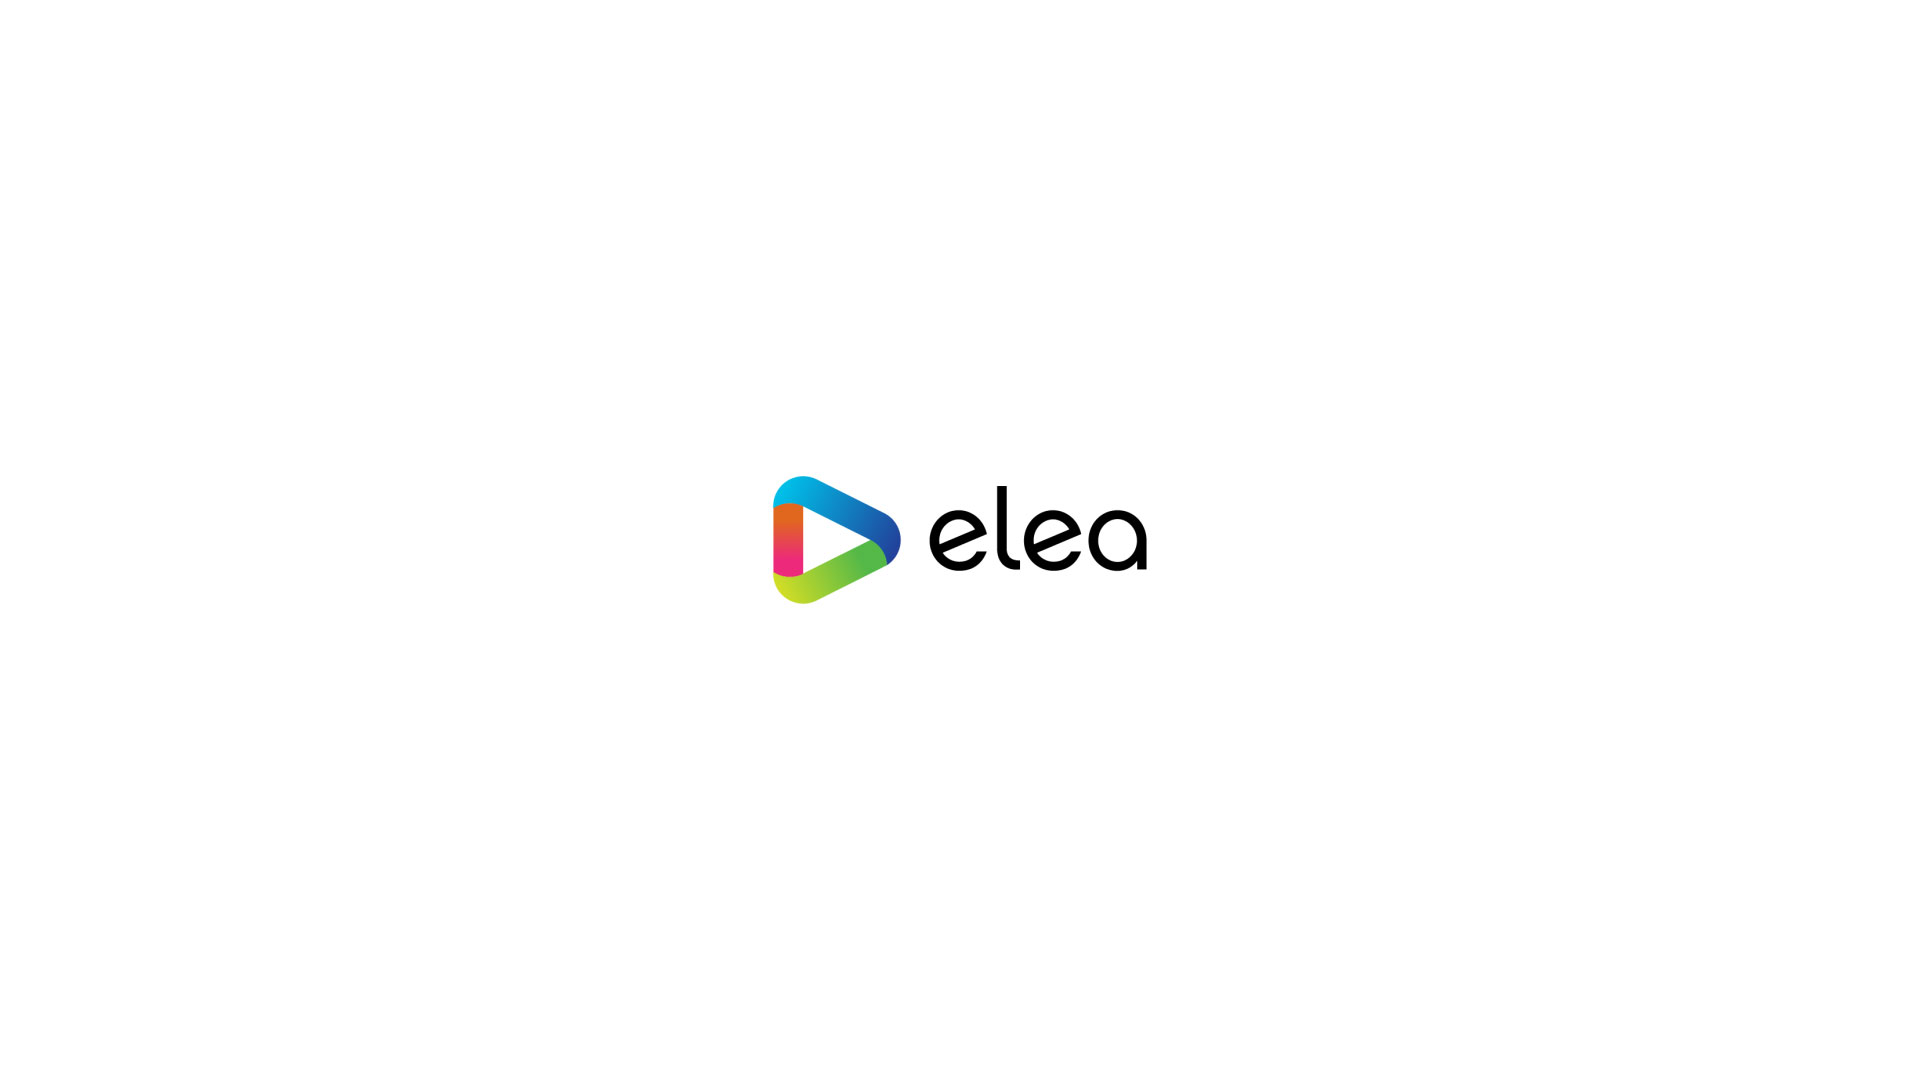 blokstudio_elea_image_film_gallery_01